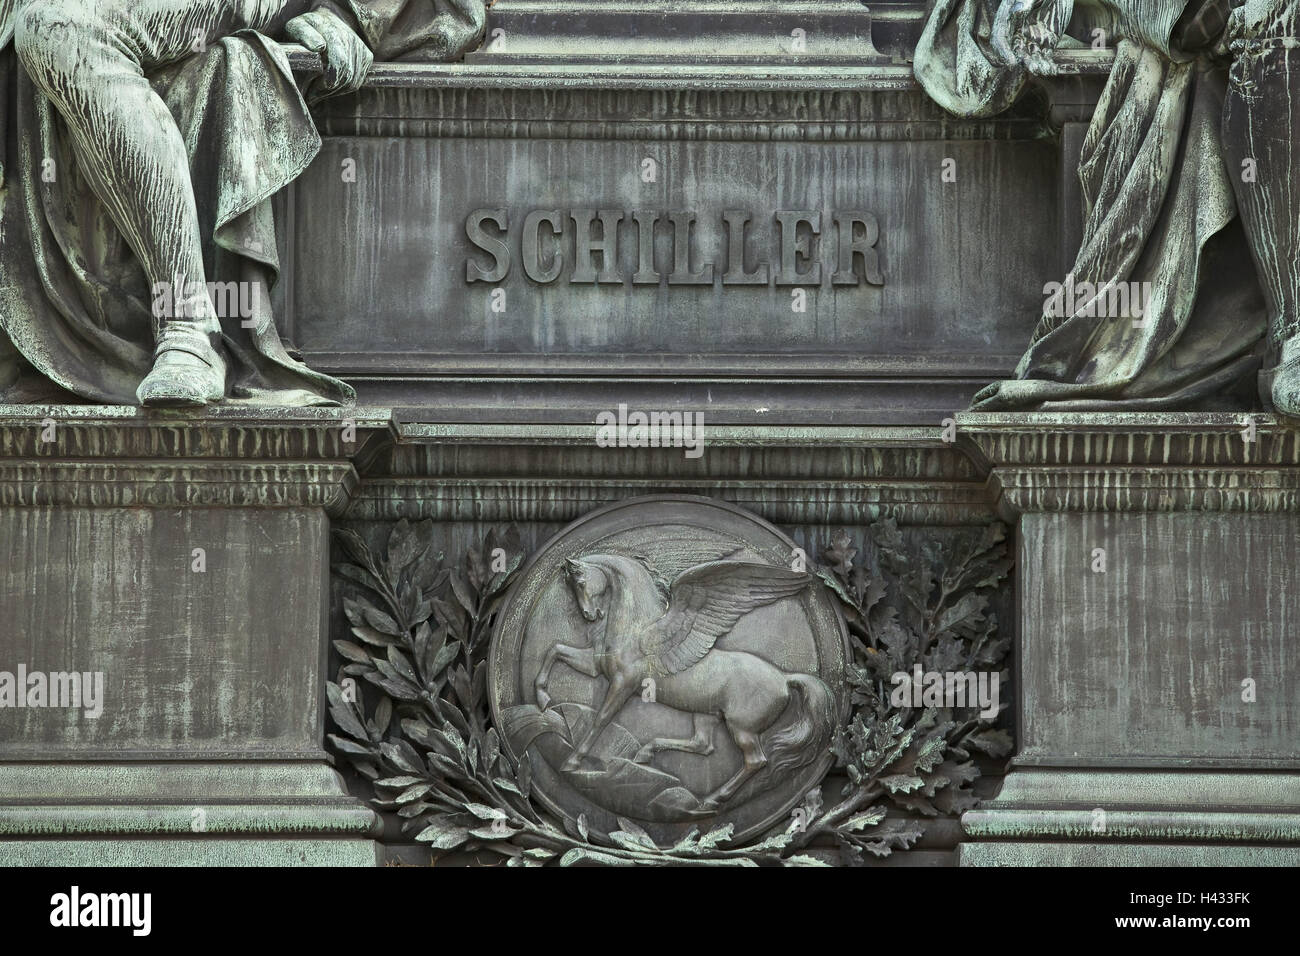 Austria, Vienna, statue, monument, shimmer, - Stock Image